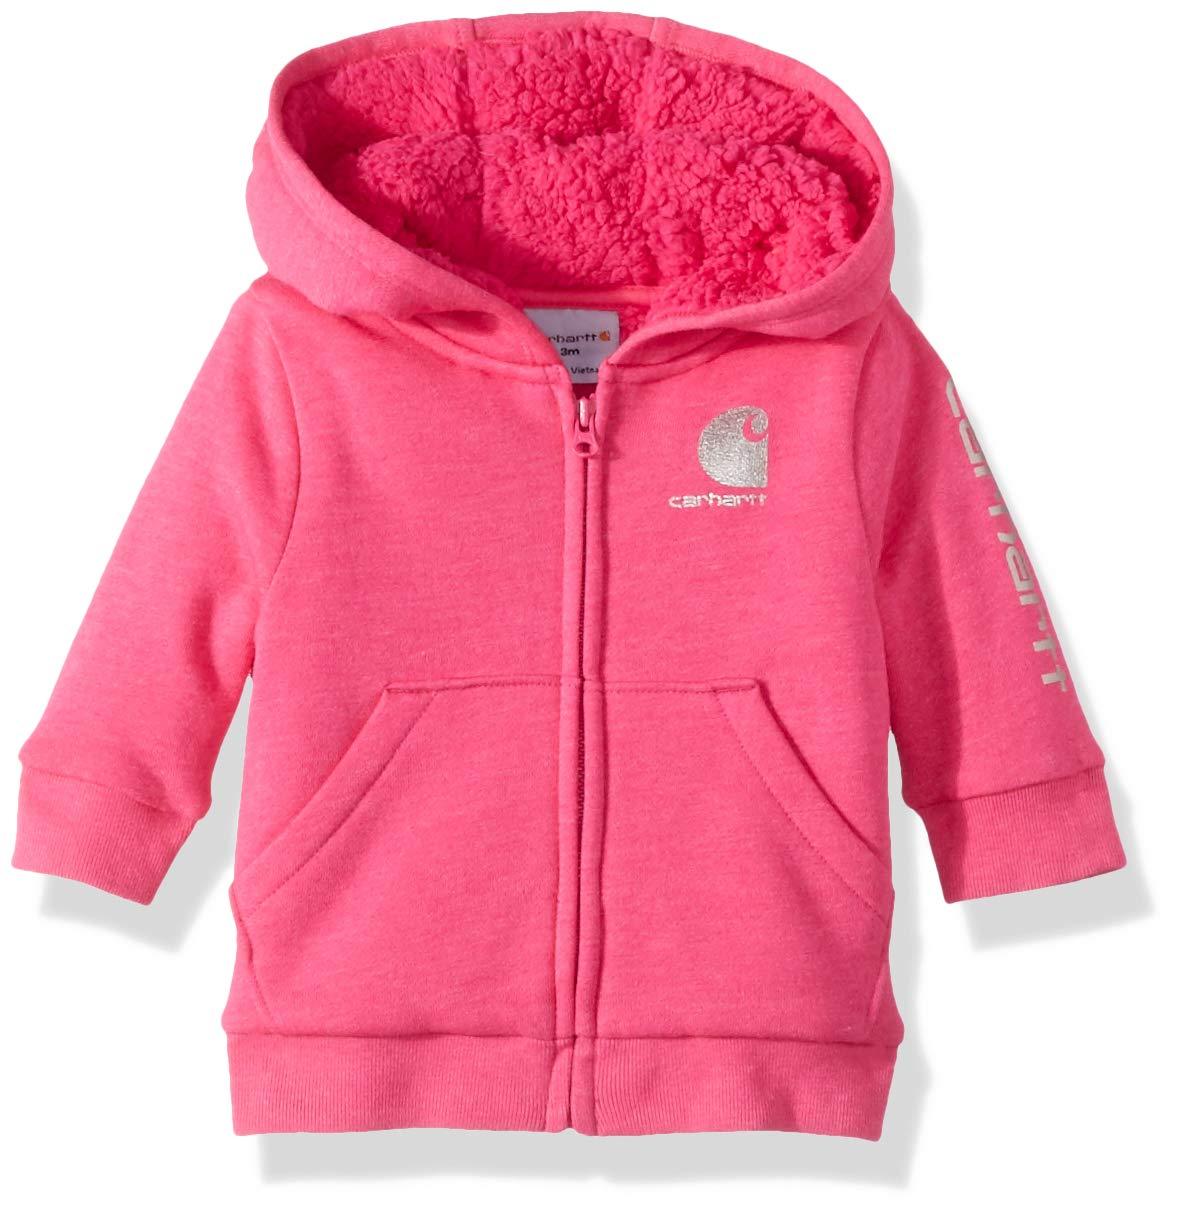 Carhartt Baby Girls Heather Fleece Jacket, Fuchsia, 3M by Carhartt